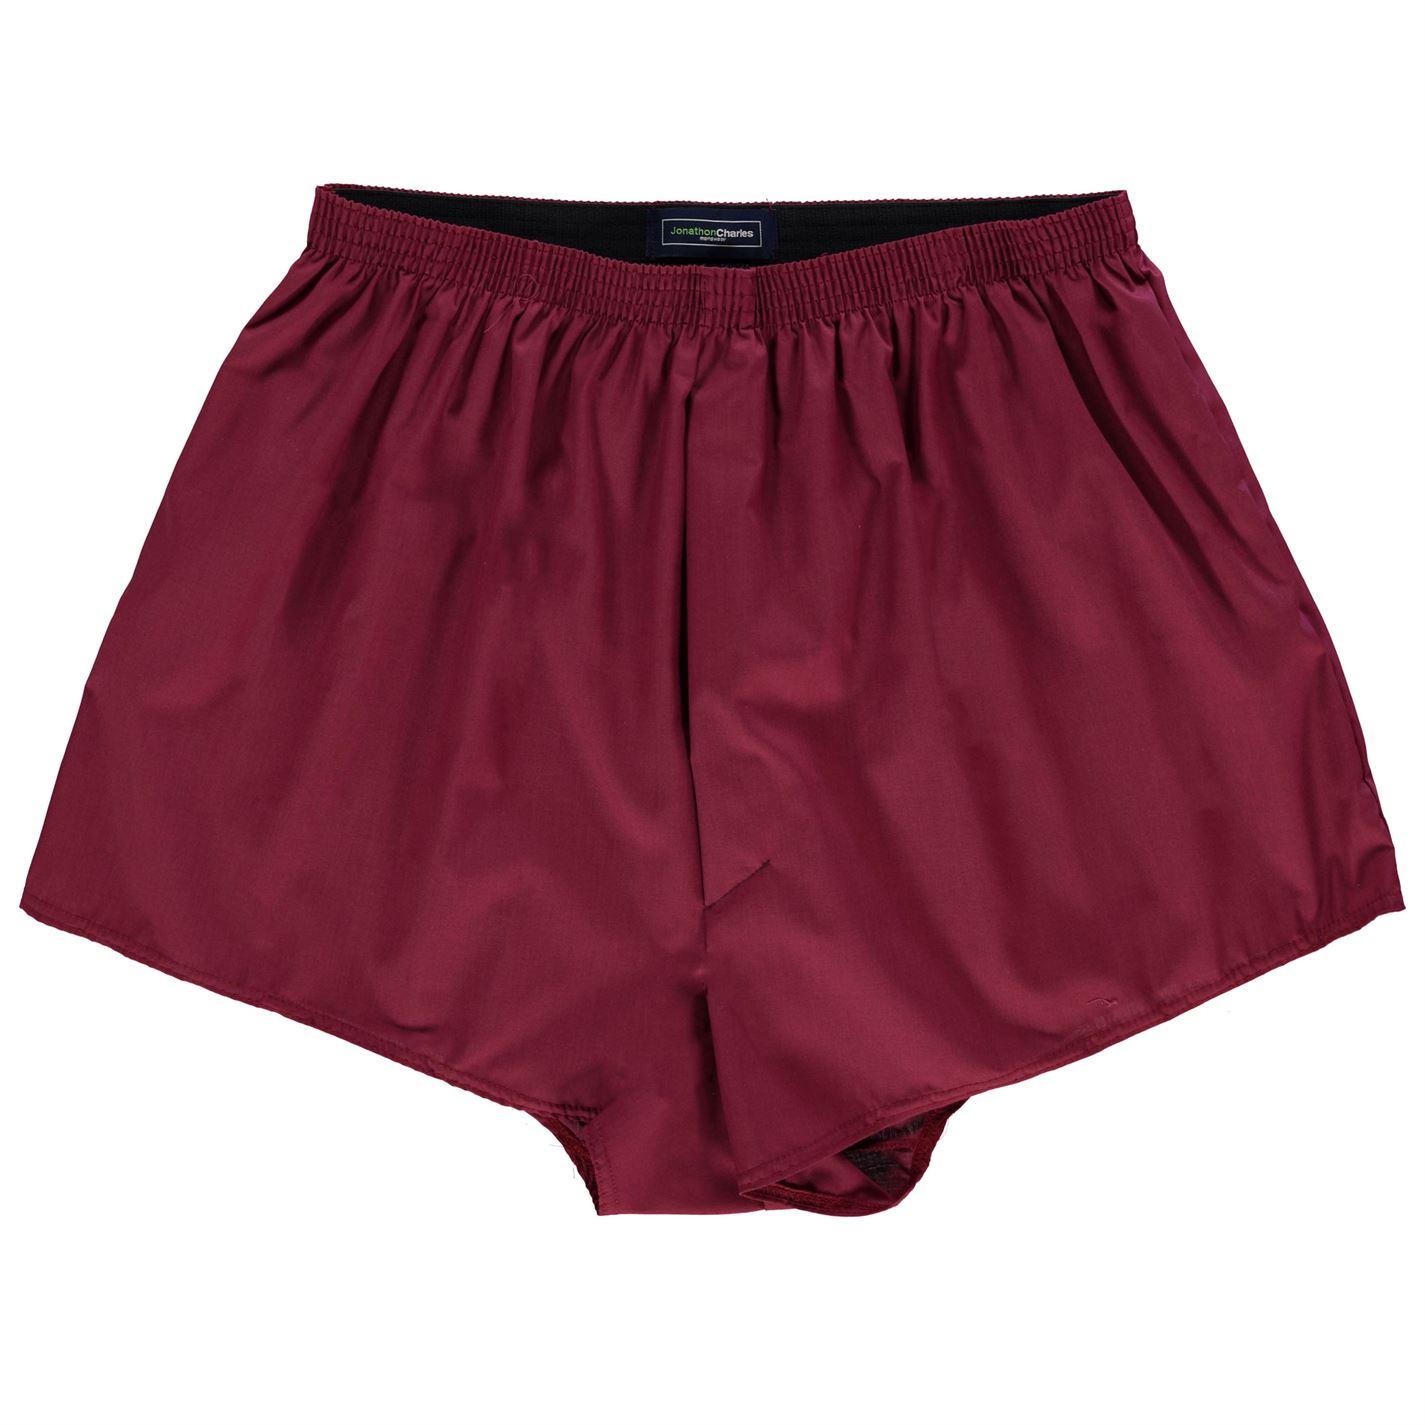 Juicy Plain Boxer Shorts Mens